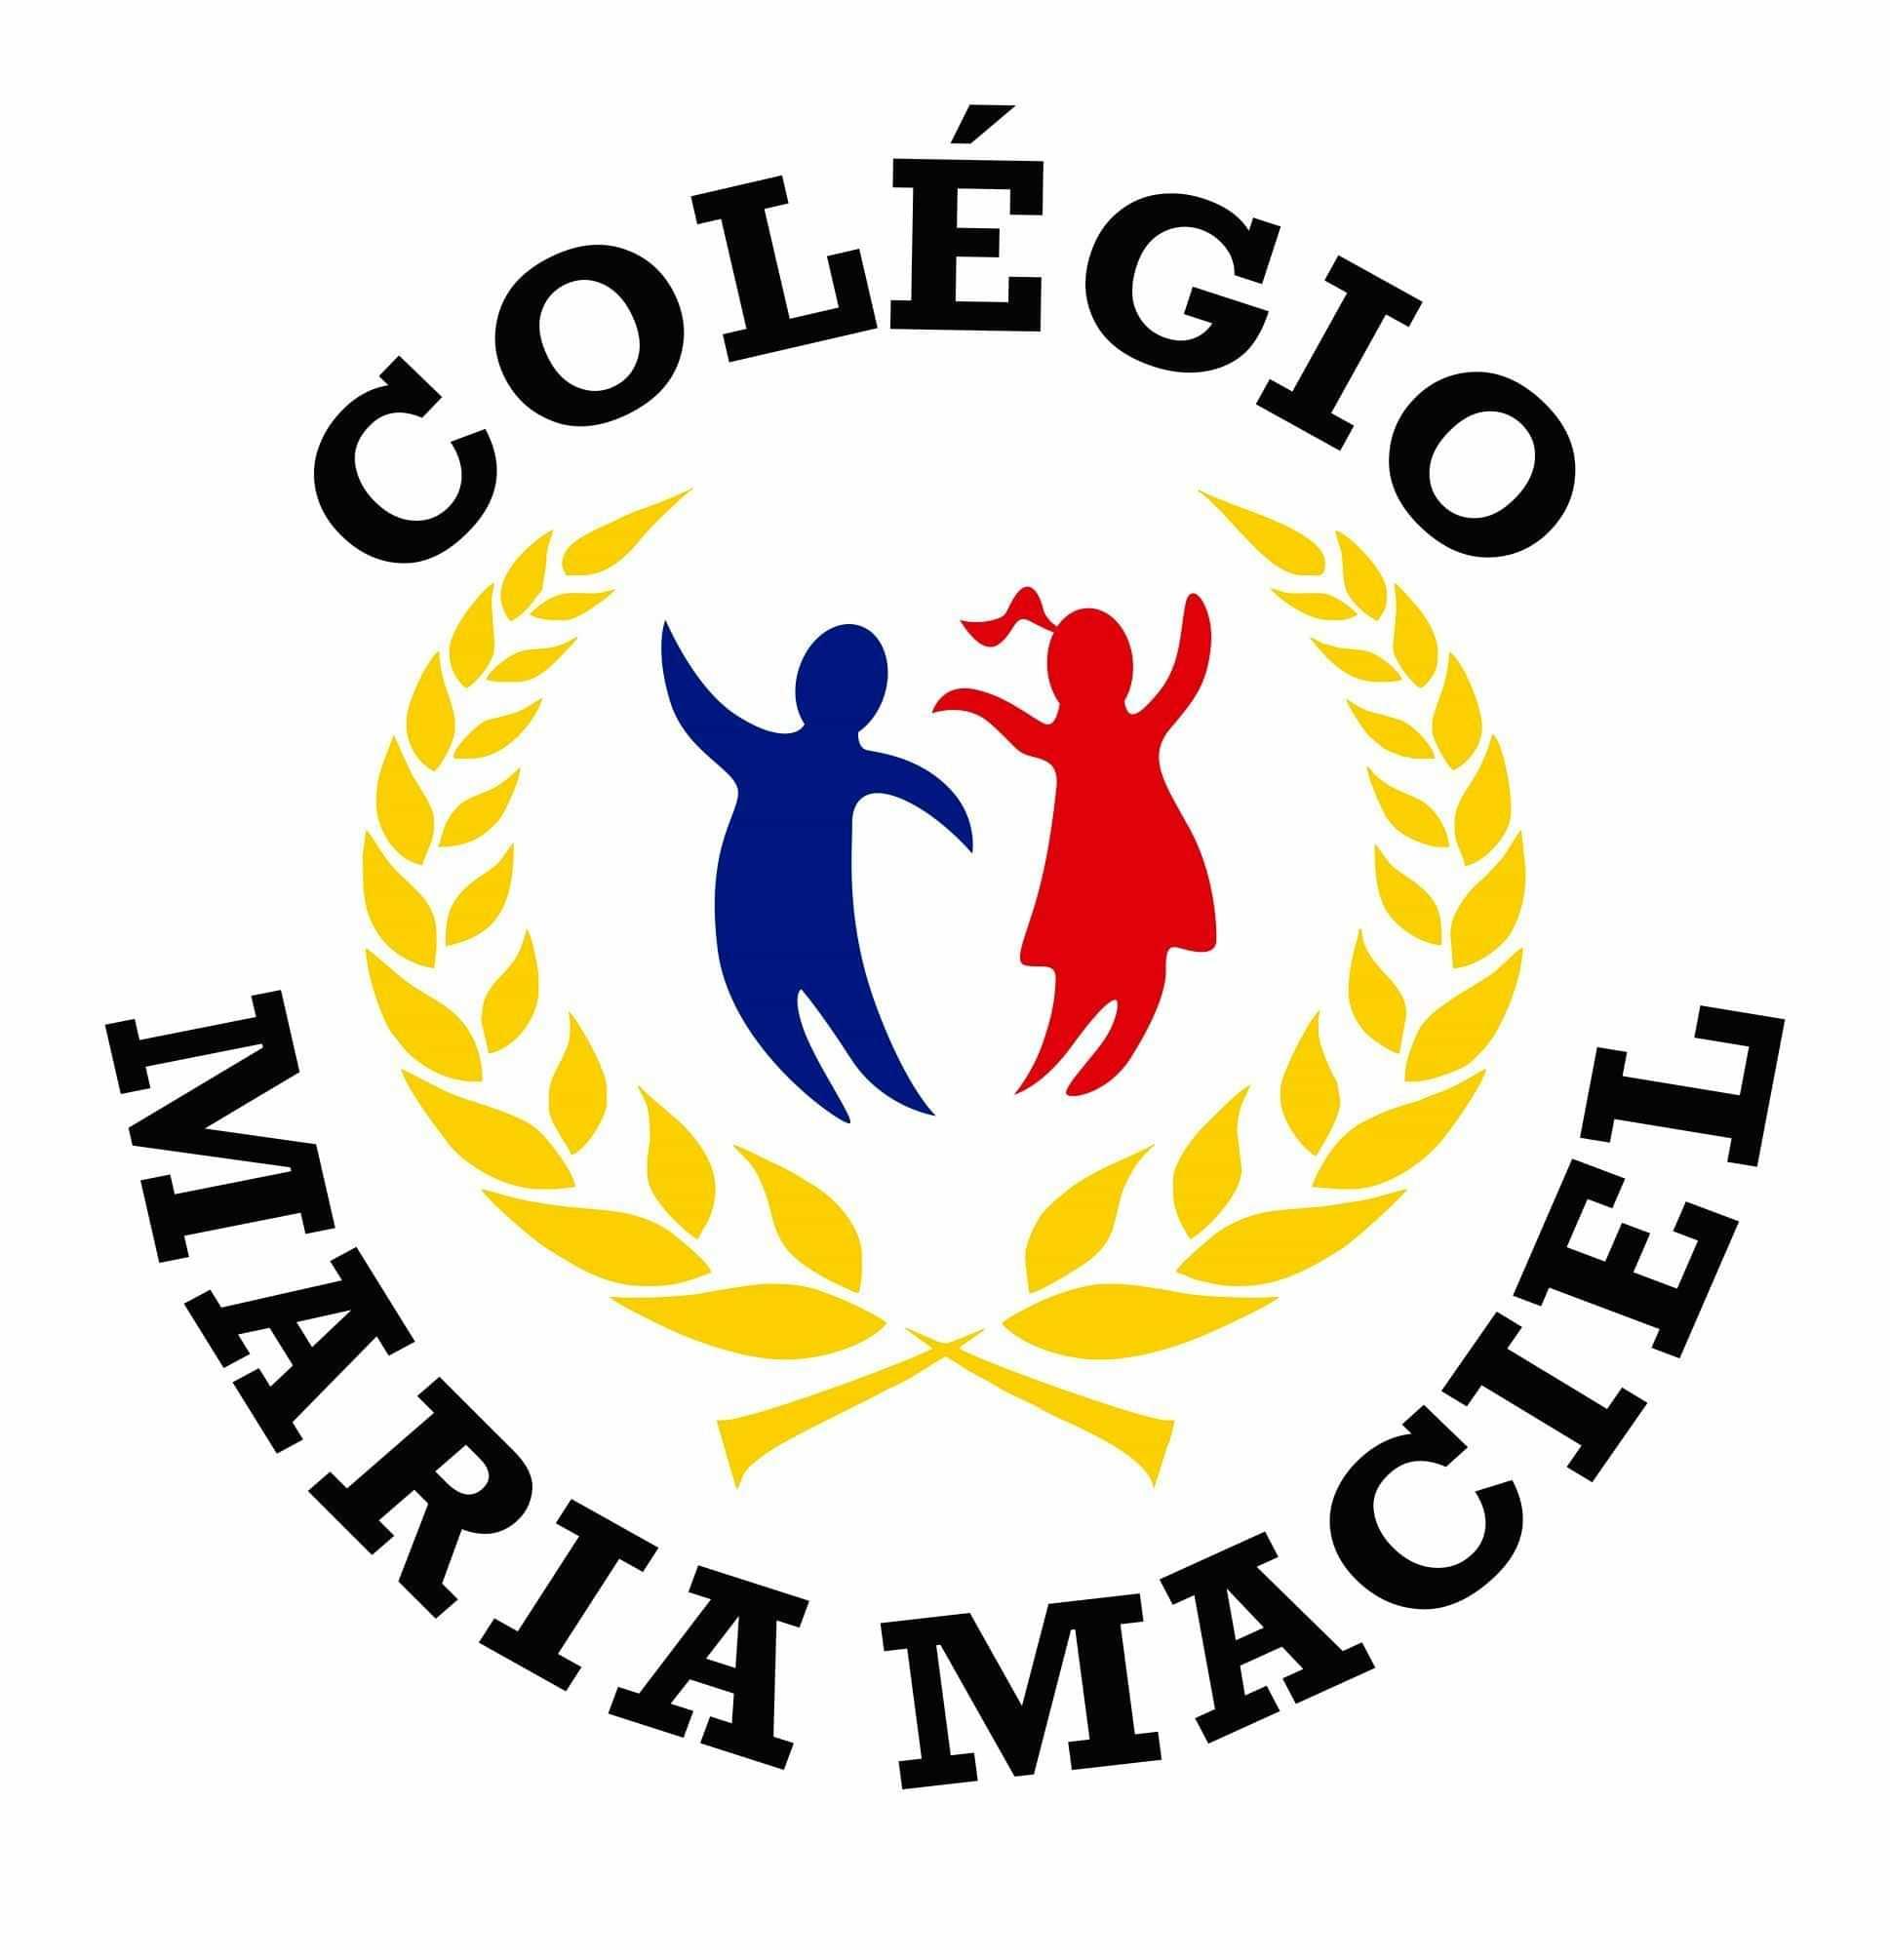 COLÉGIO MARIA MACIEL